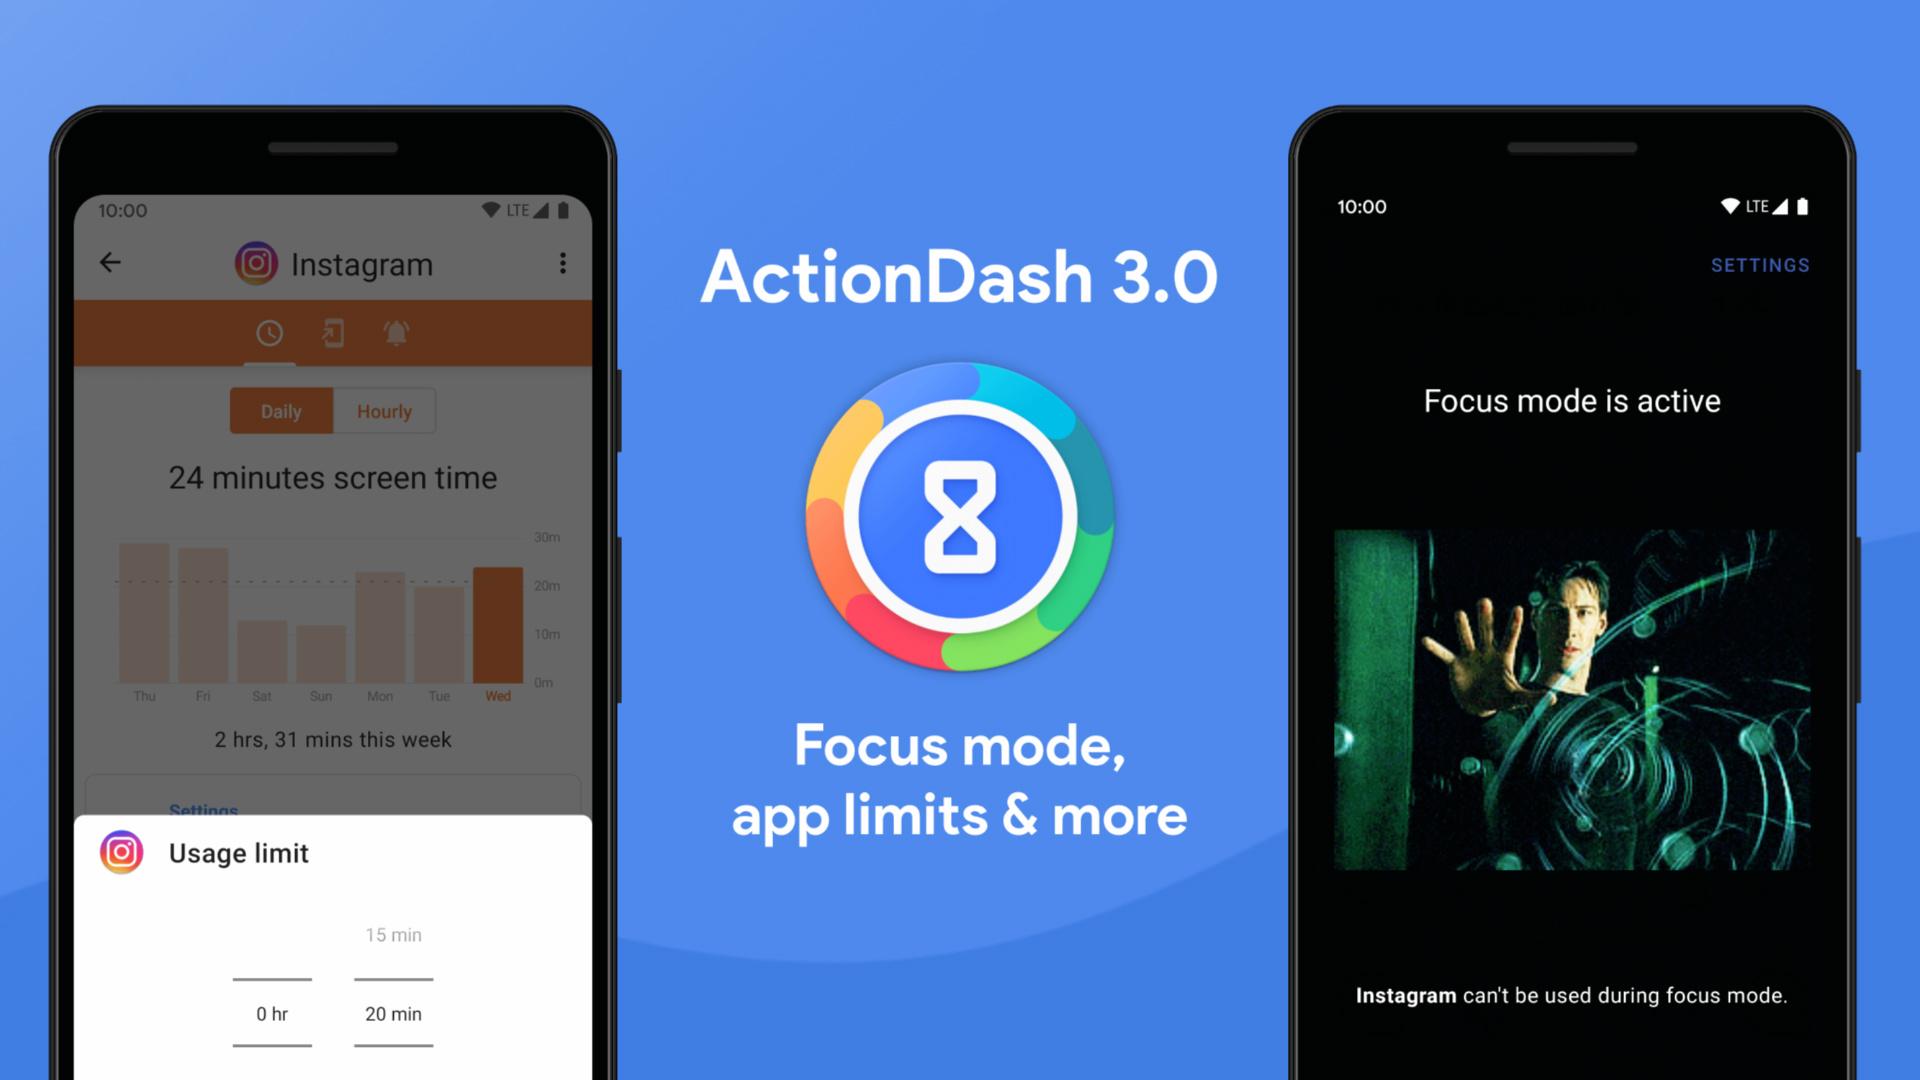 Press image of ActionDash 3.0